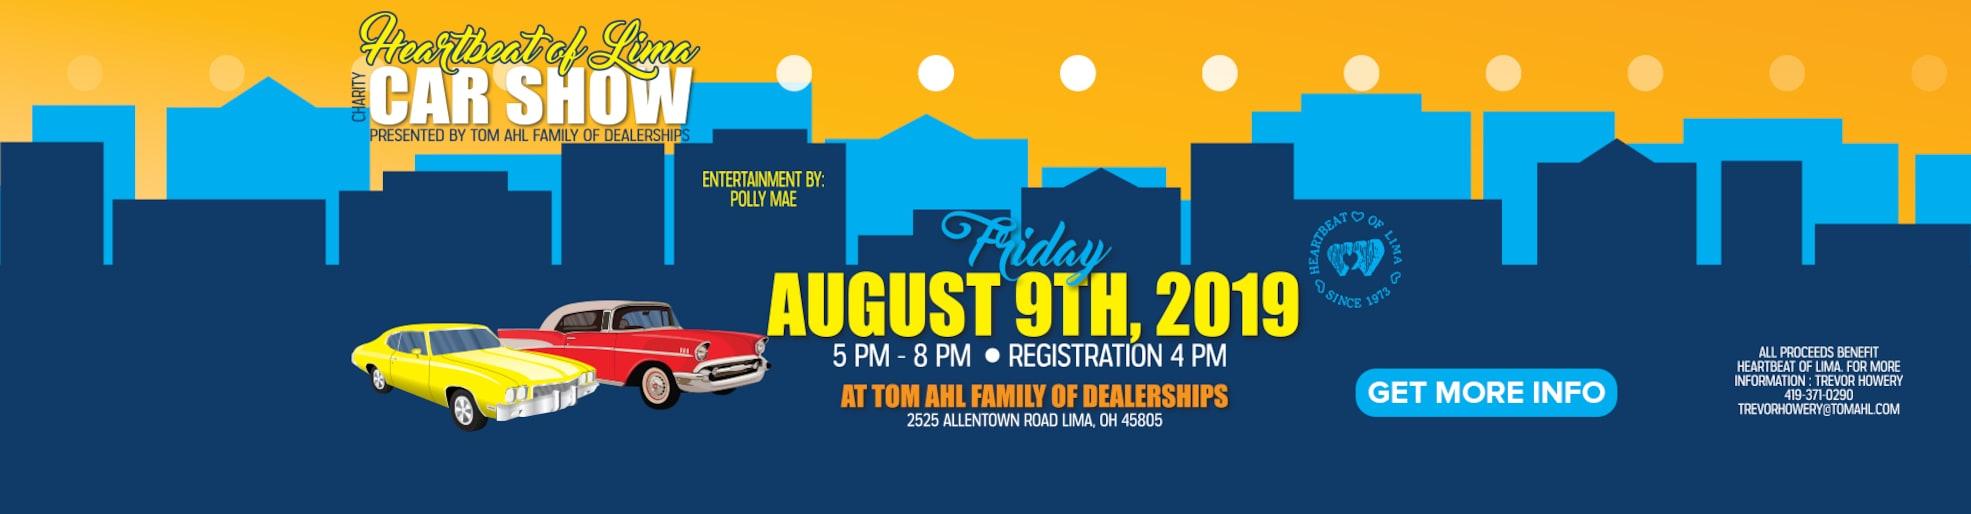 Car Dealerships In Lima Ohio >> Tom Ahl Family Of Dealerships Lima Oh Chrysler Dodge Jeep Ram